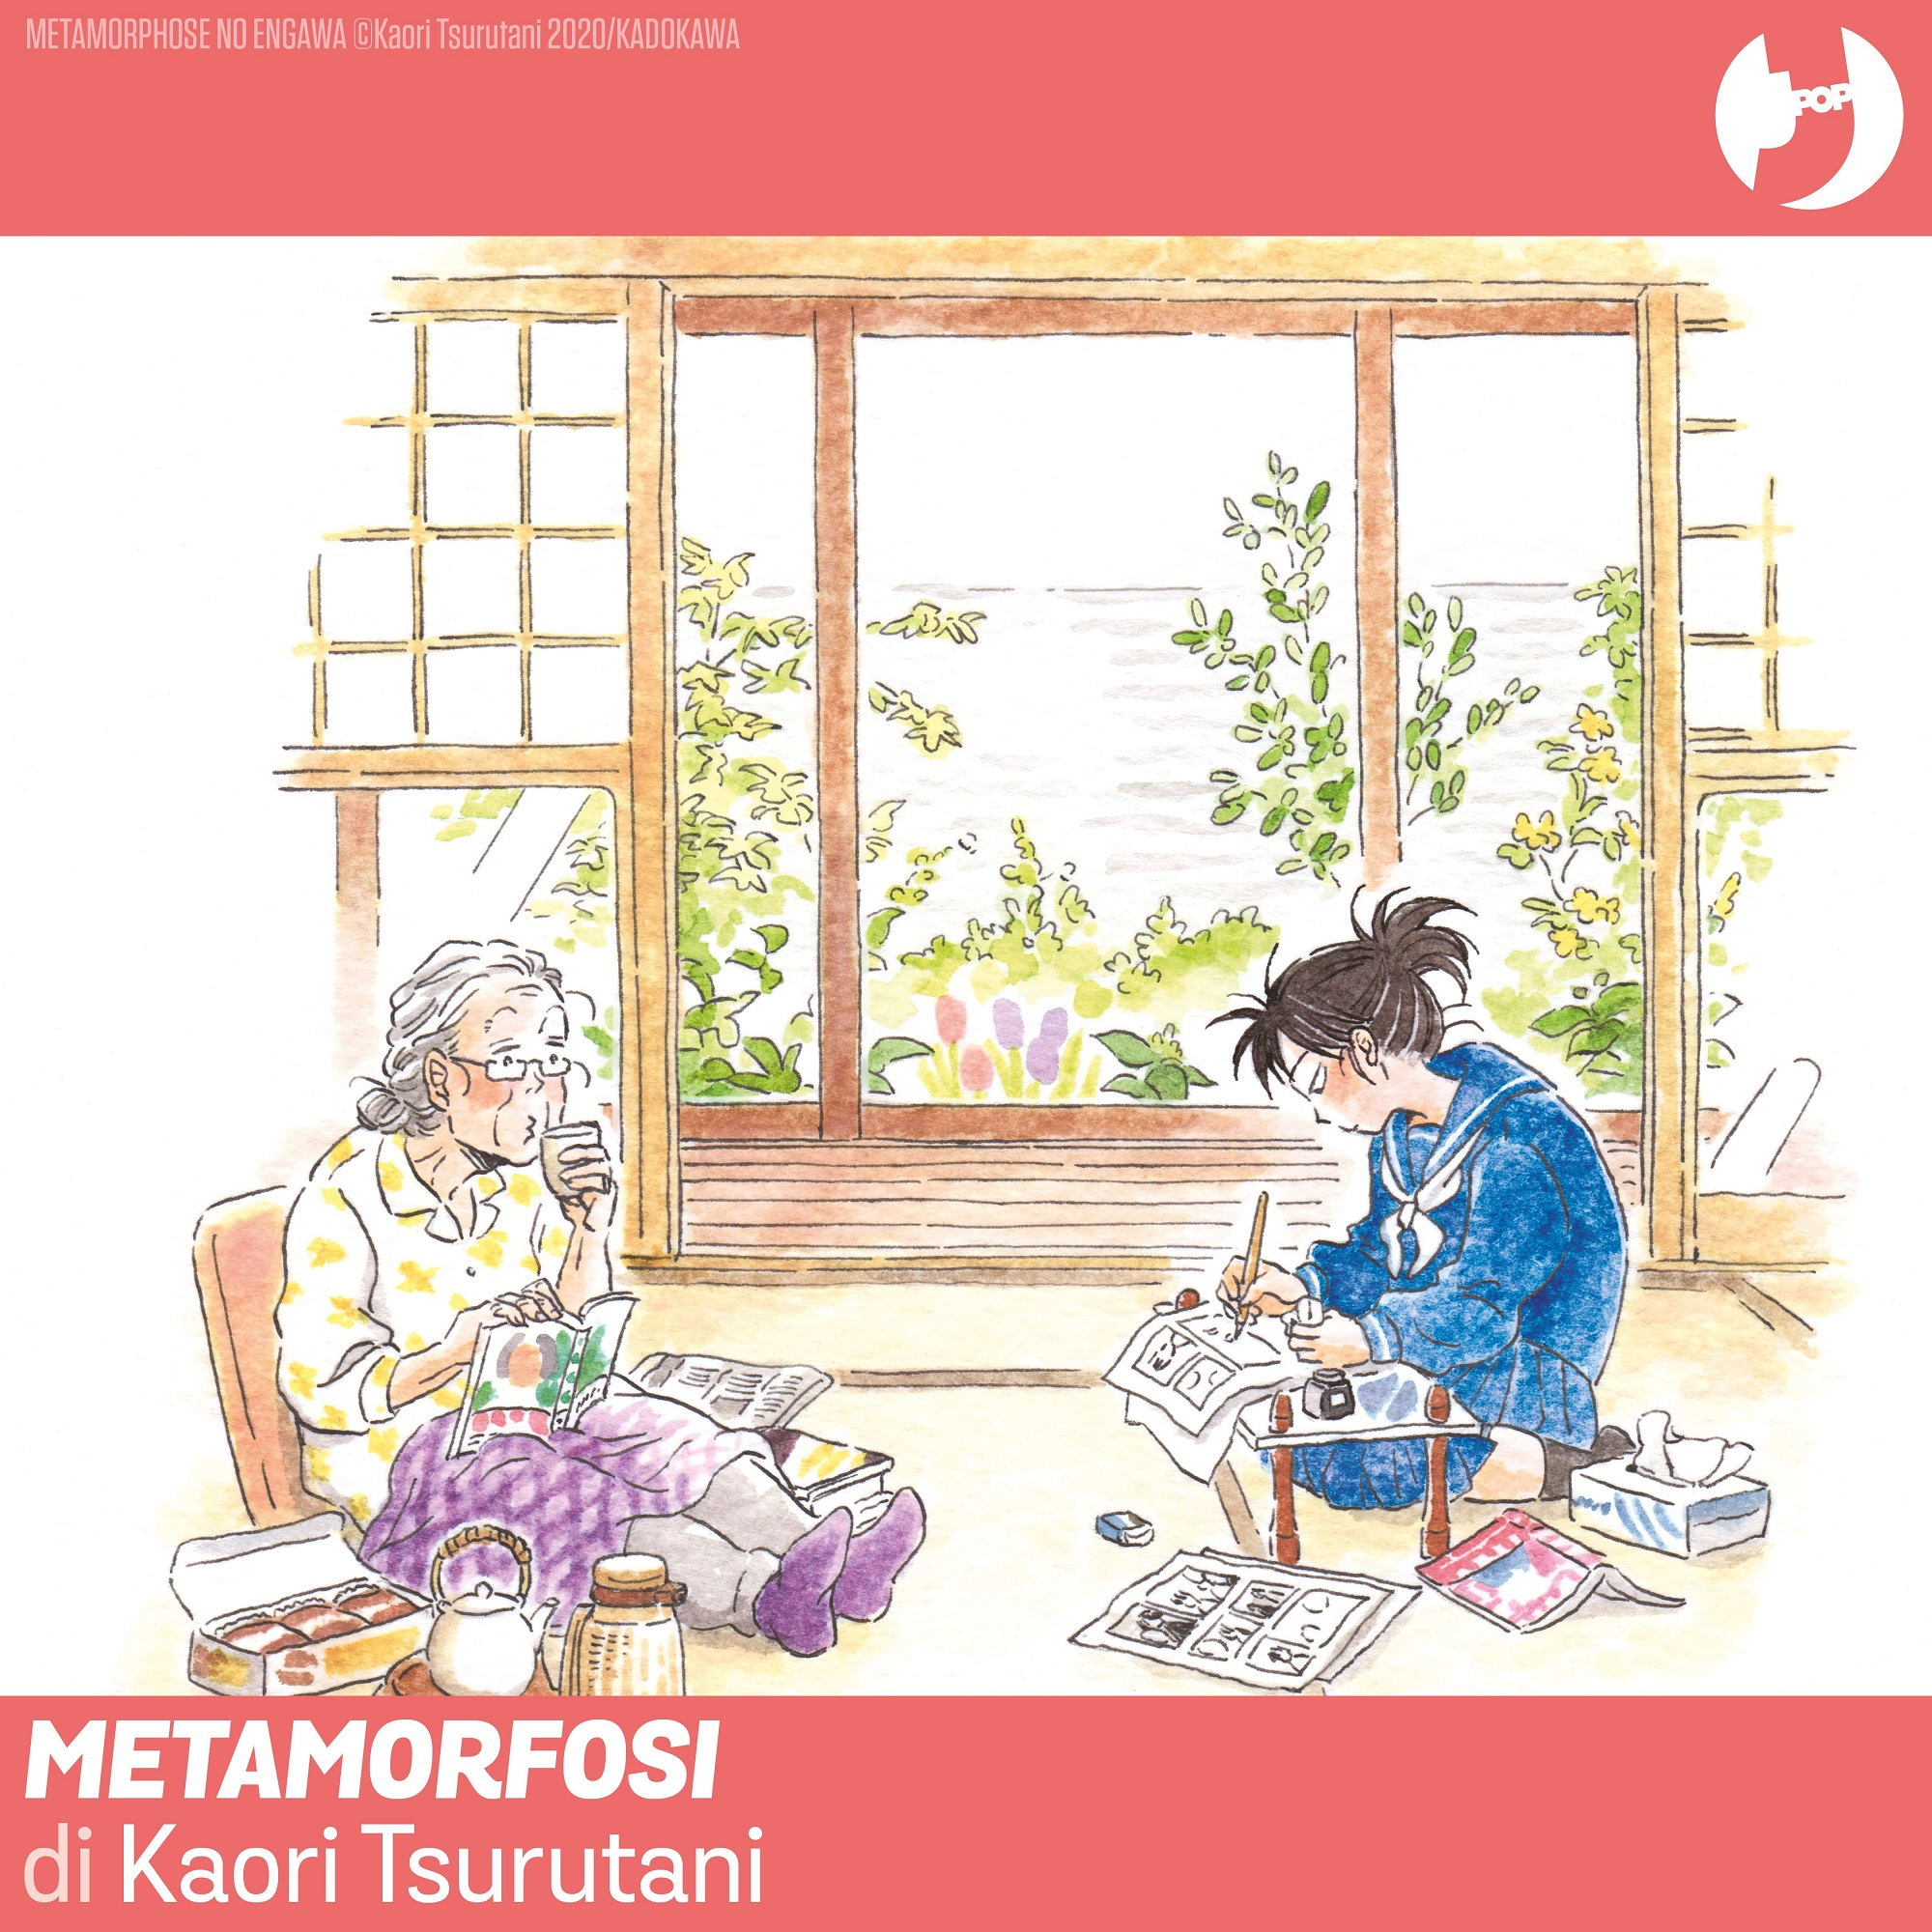 Metamorfosi - Recensione del primo volume